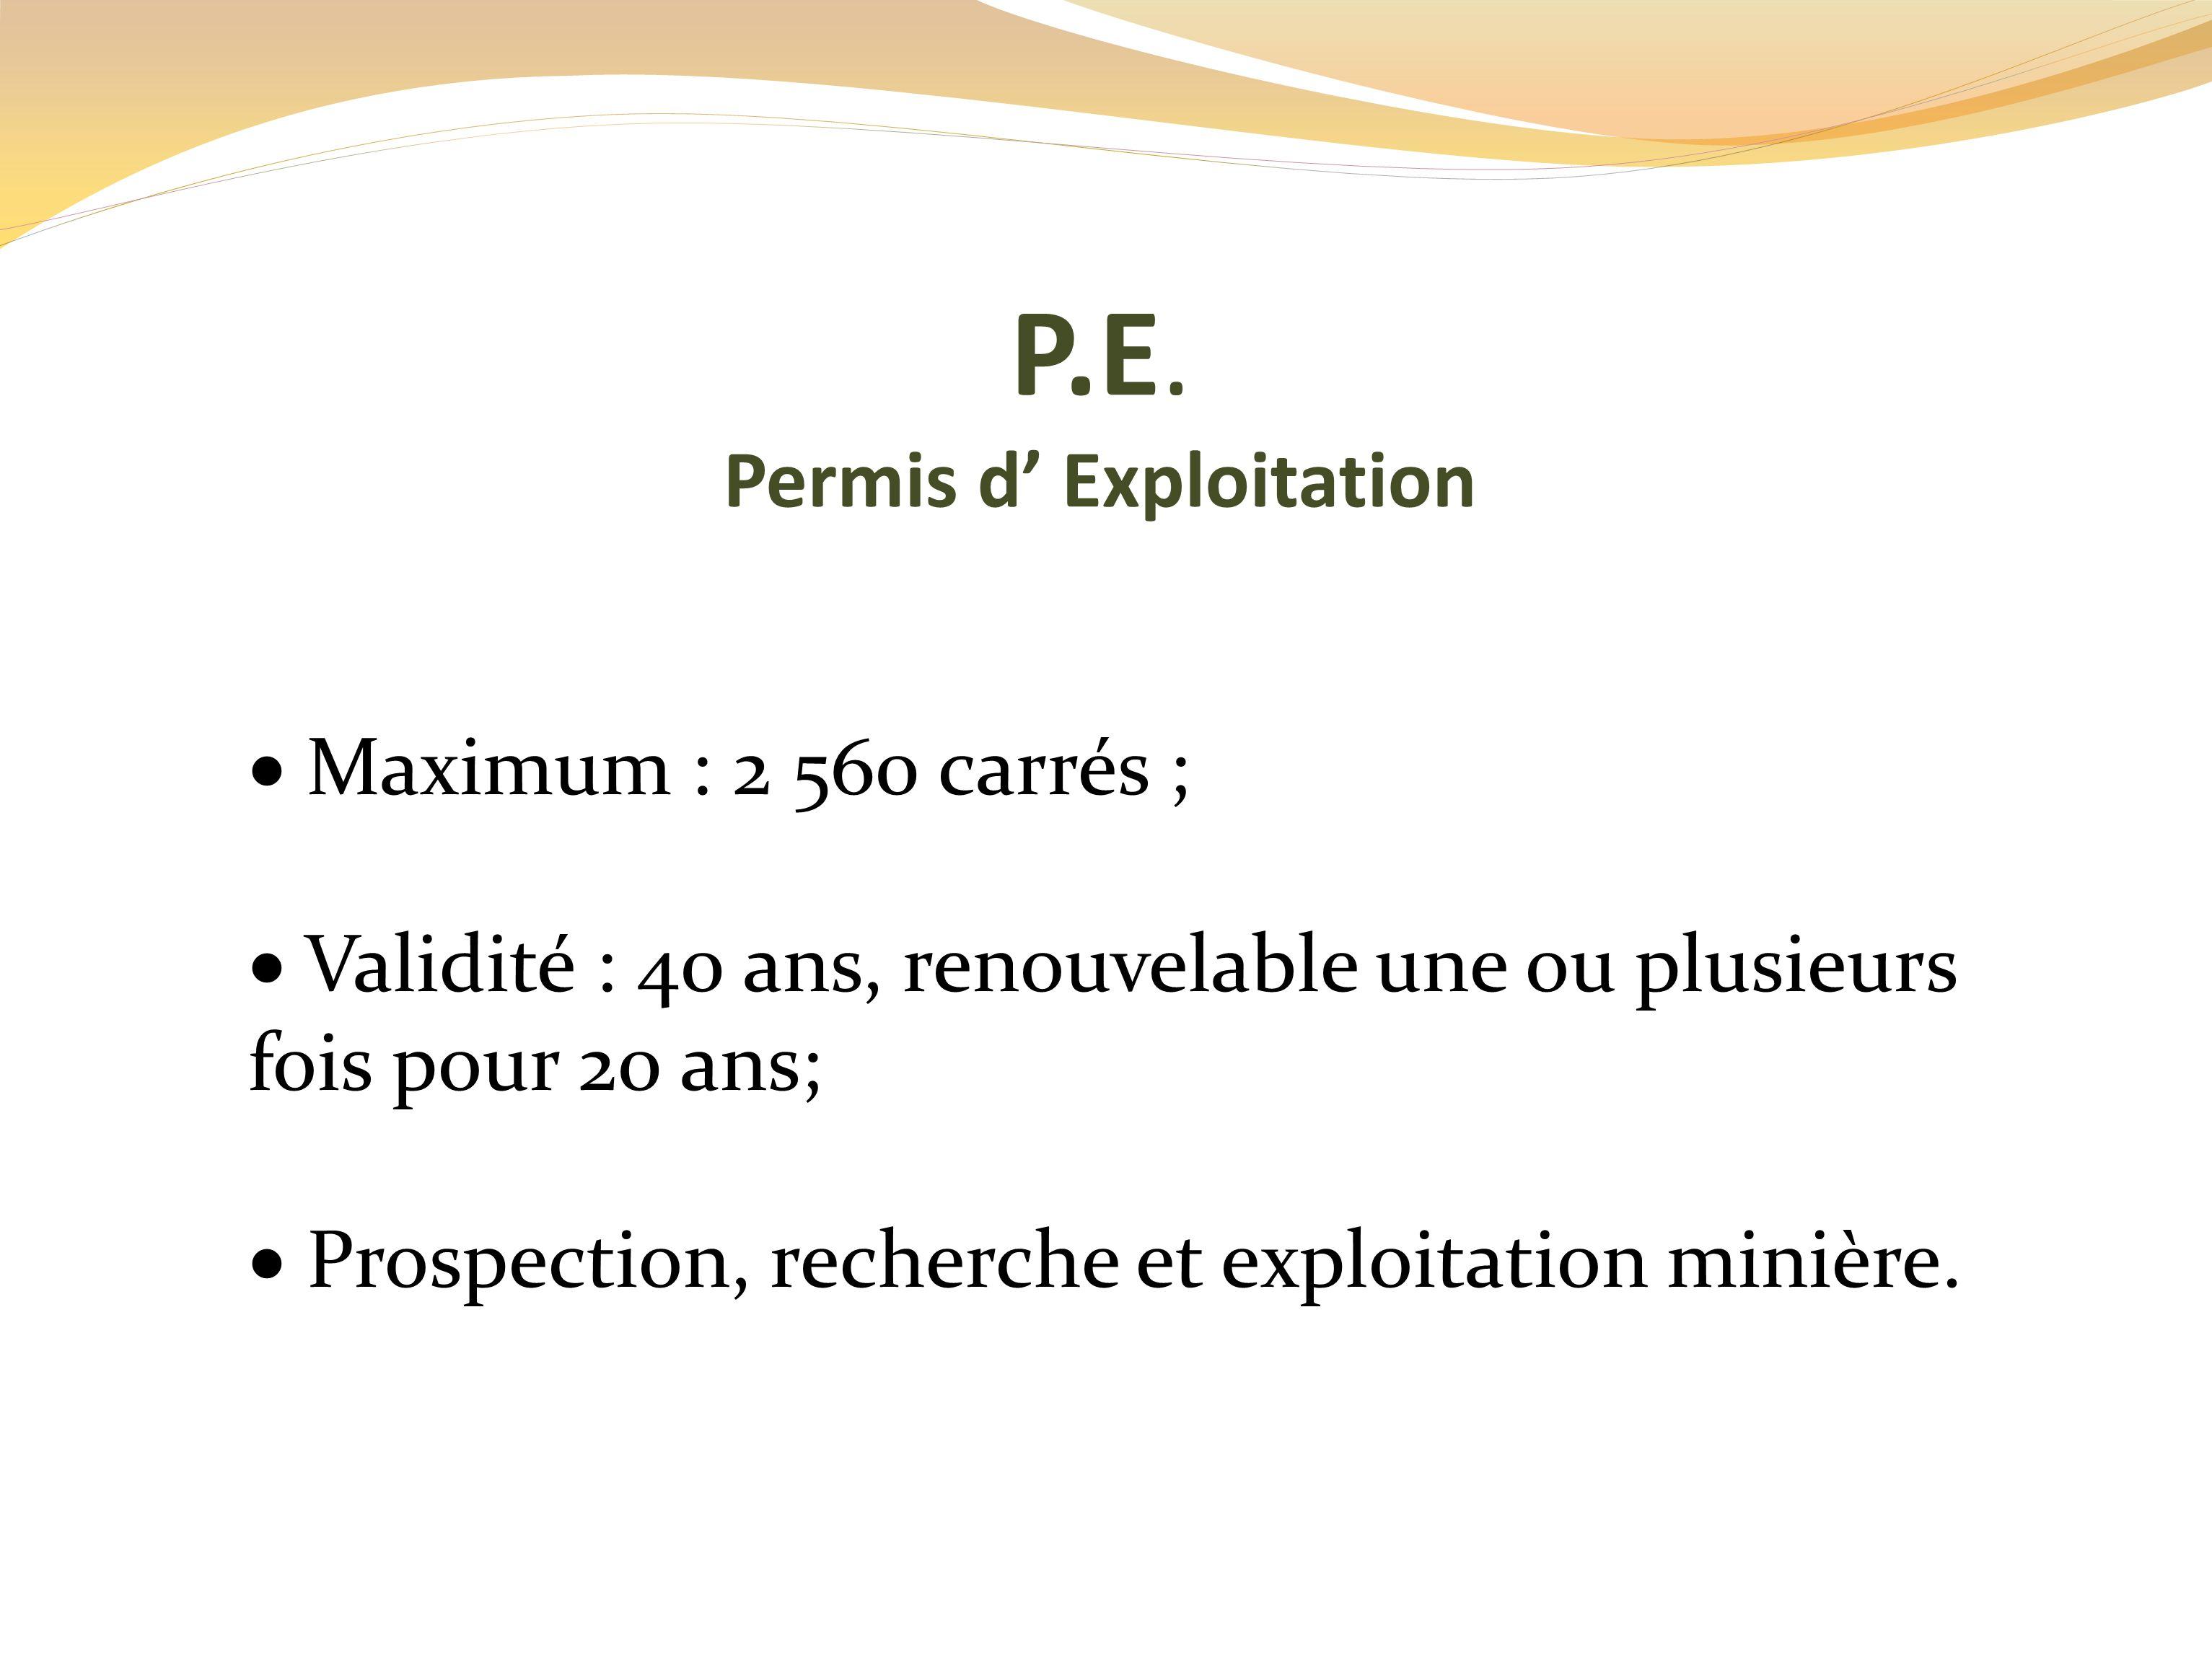 Permis d' Exploitation